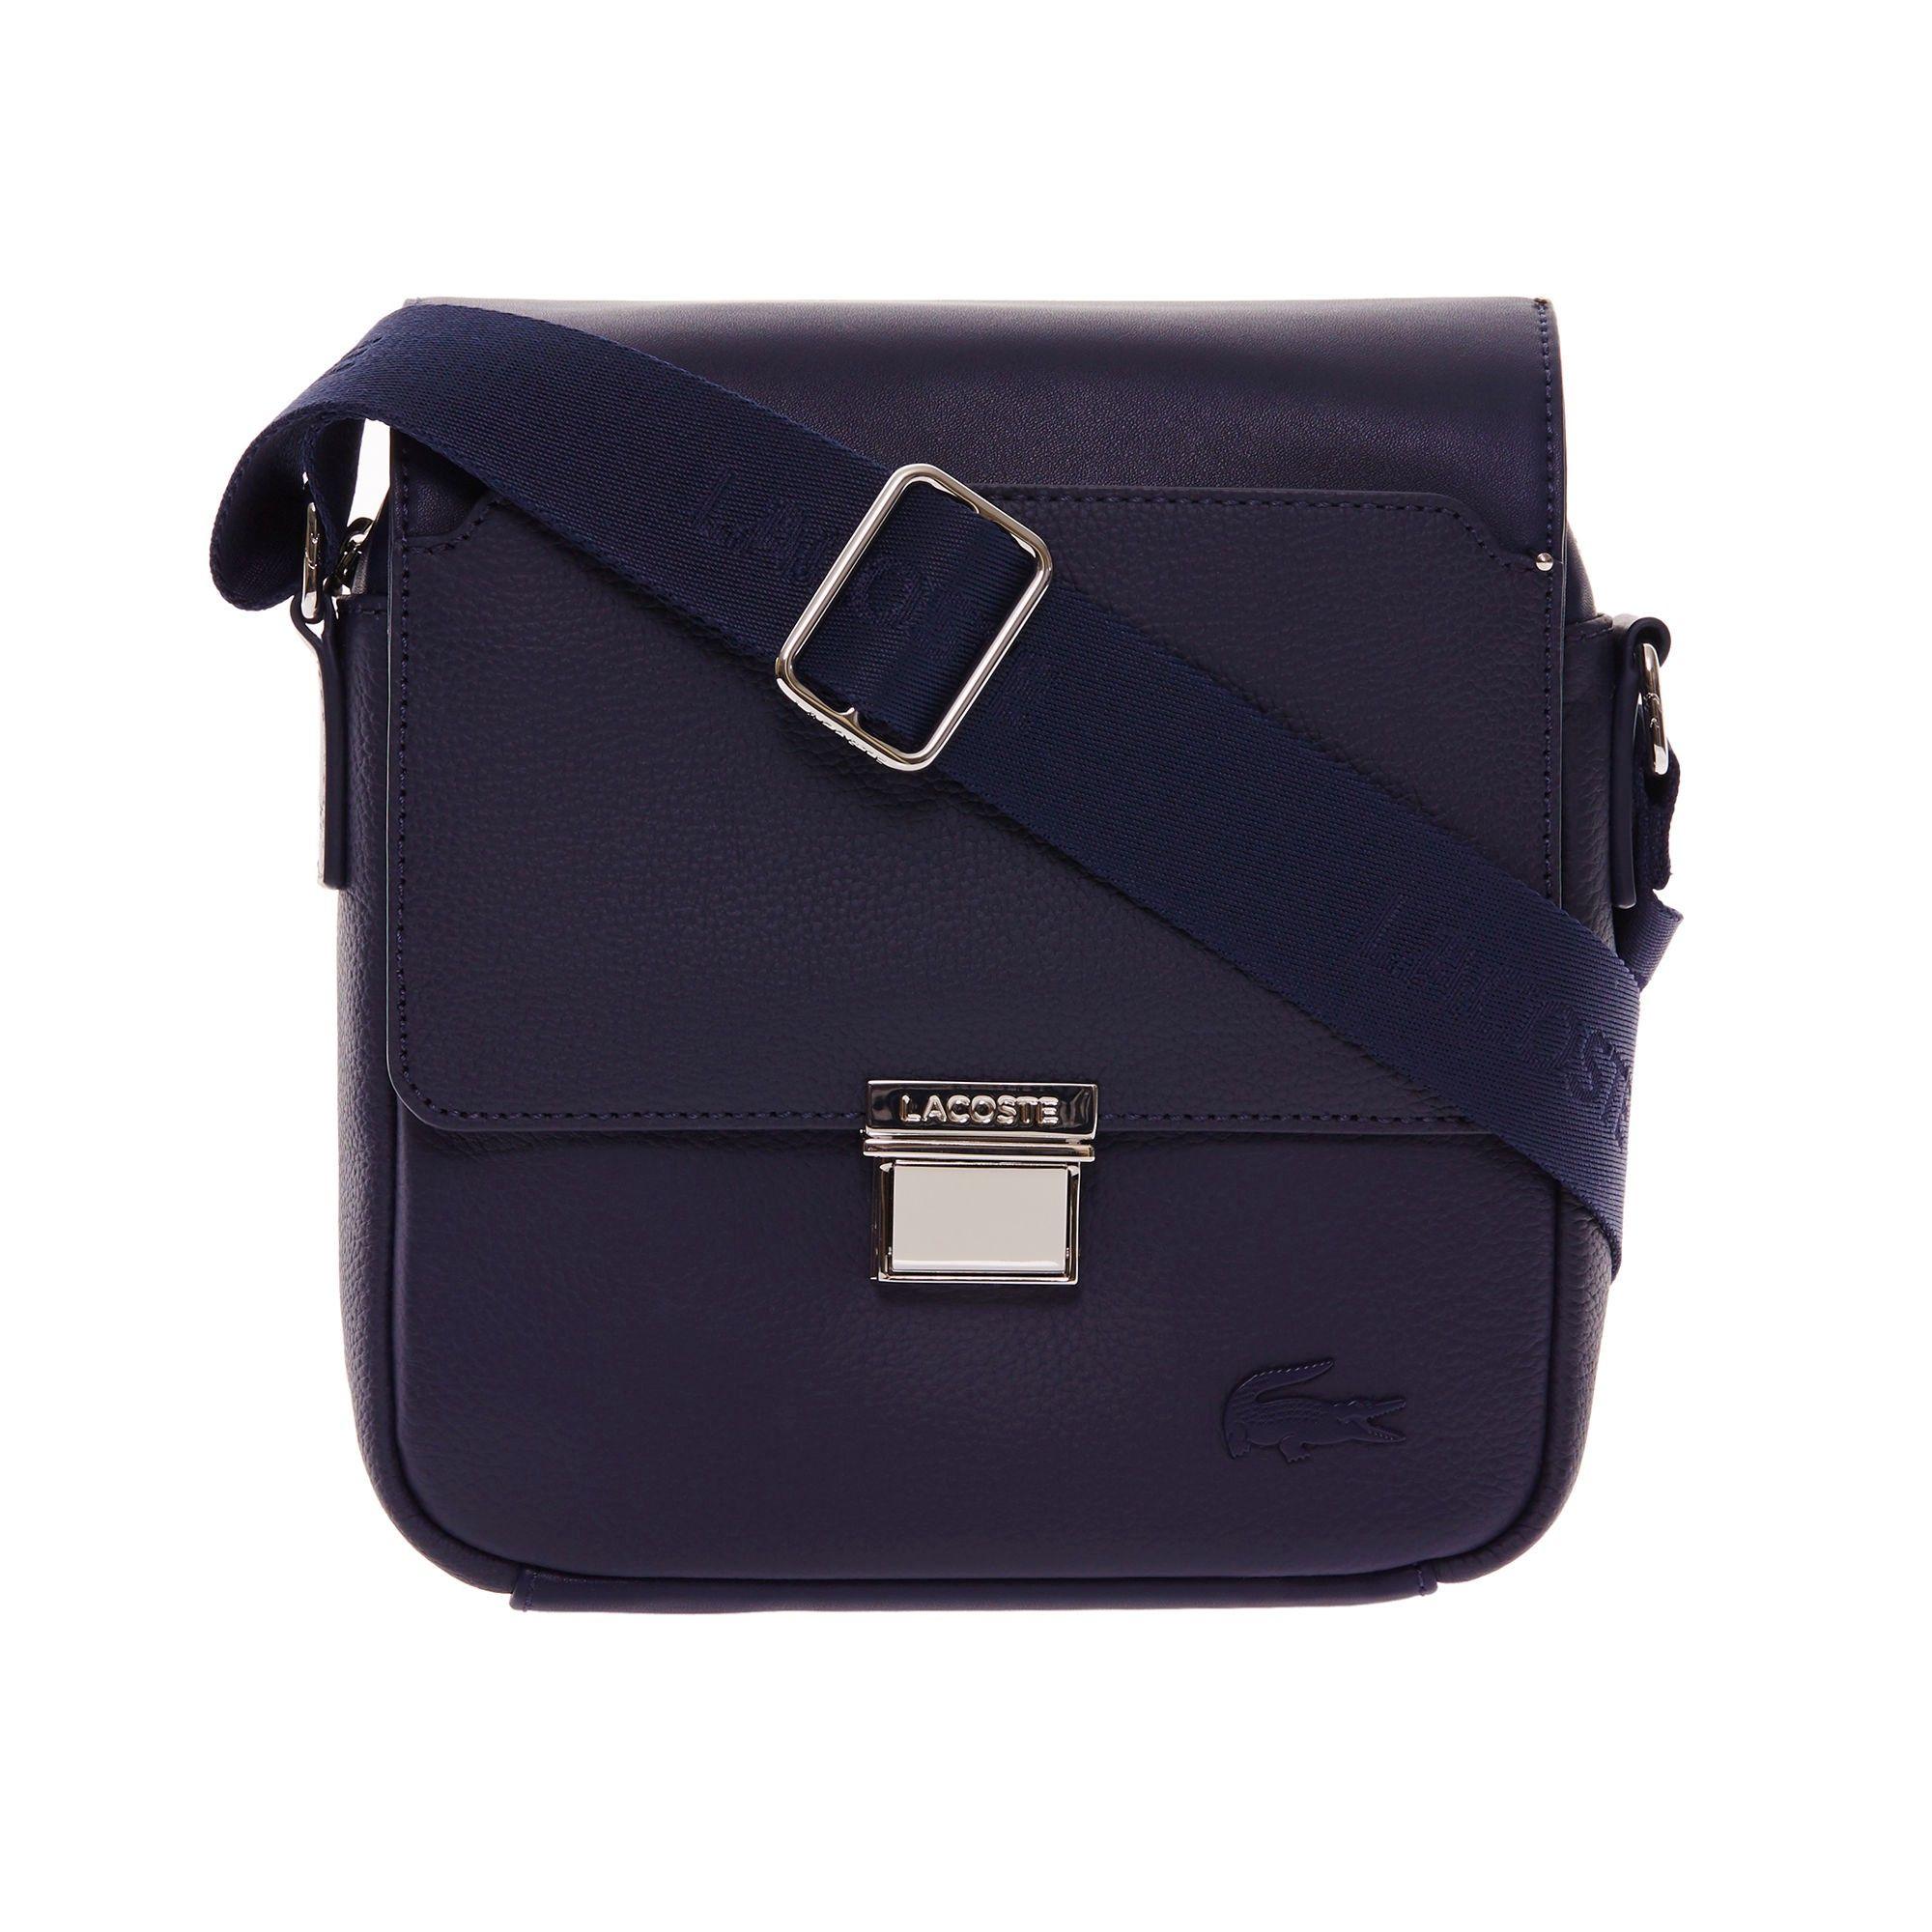 e5f6268b8 LACOSTE Men s Rafael Monochrome Leather Zip Crossover Bag - peacoat.   lacoste  bags  leather